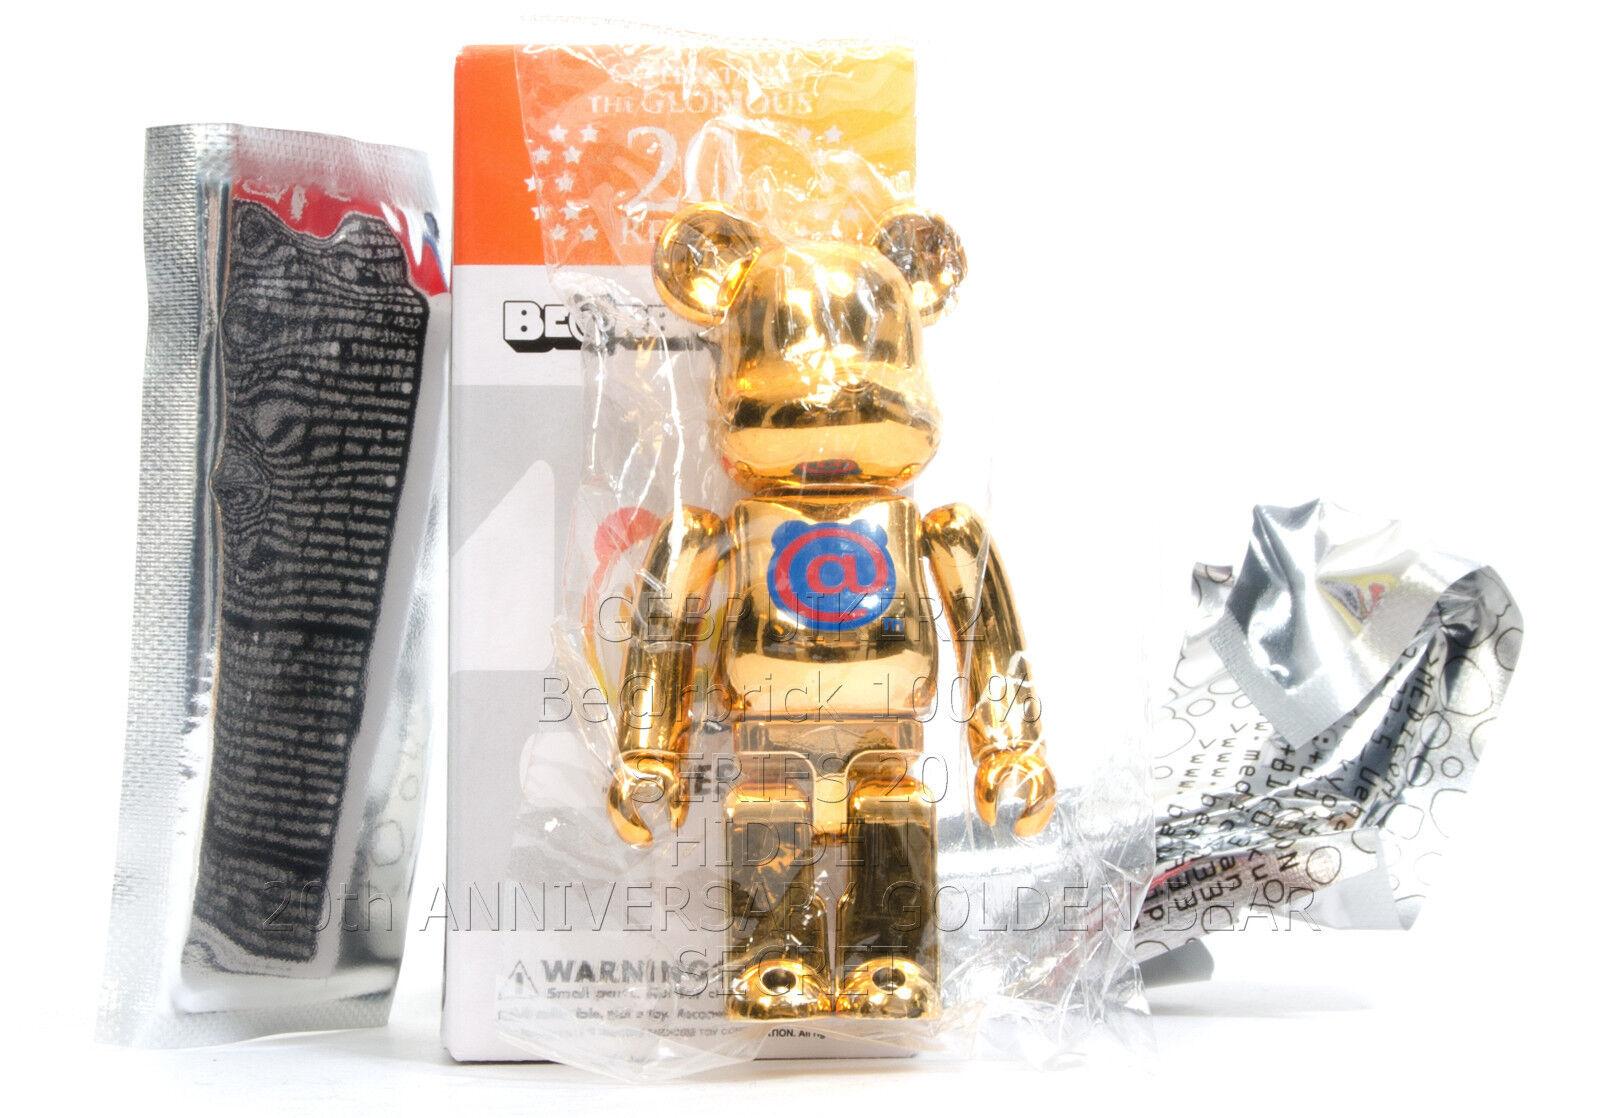 Medicom Toy Bearbrick 100% SERIES 20 SECRET 20TH ANNIVERSARY GoldEN BEAR